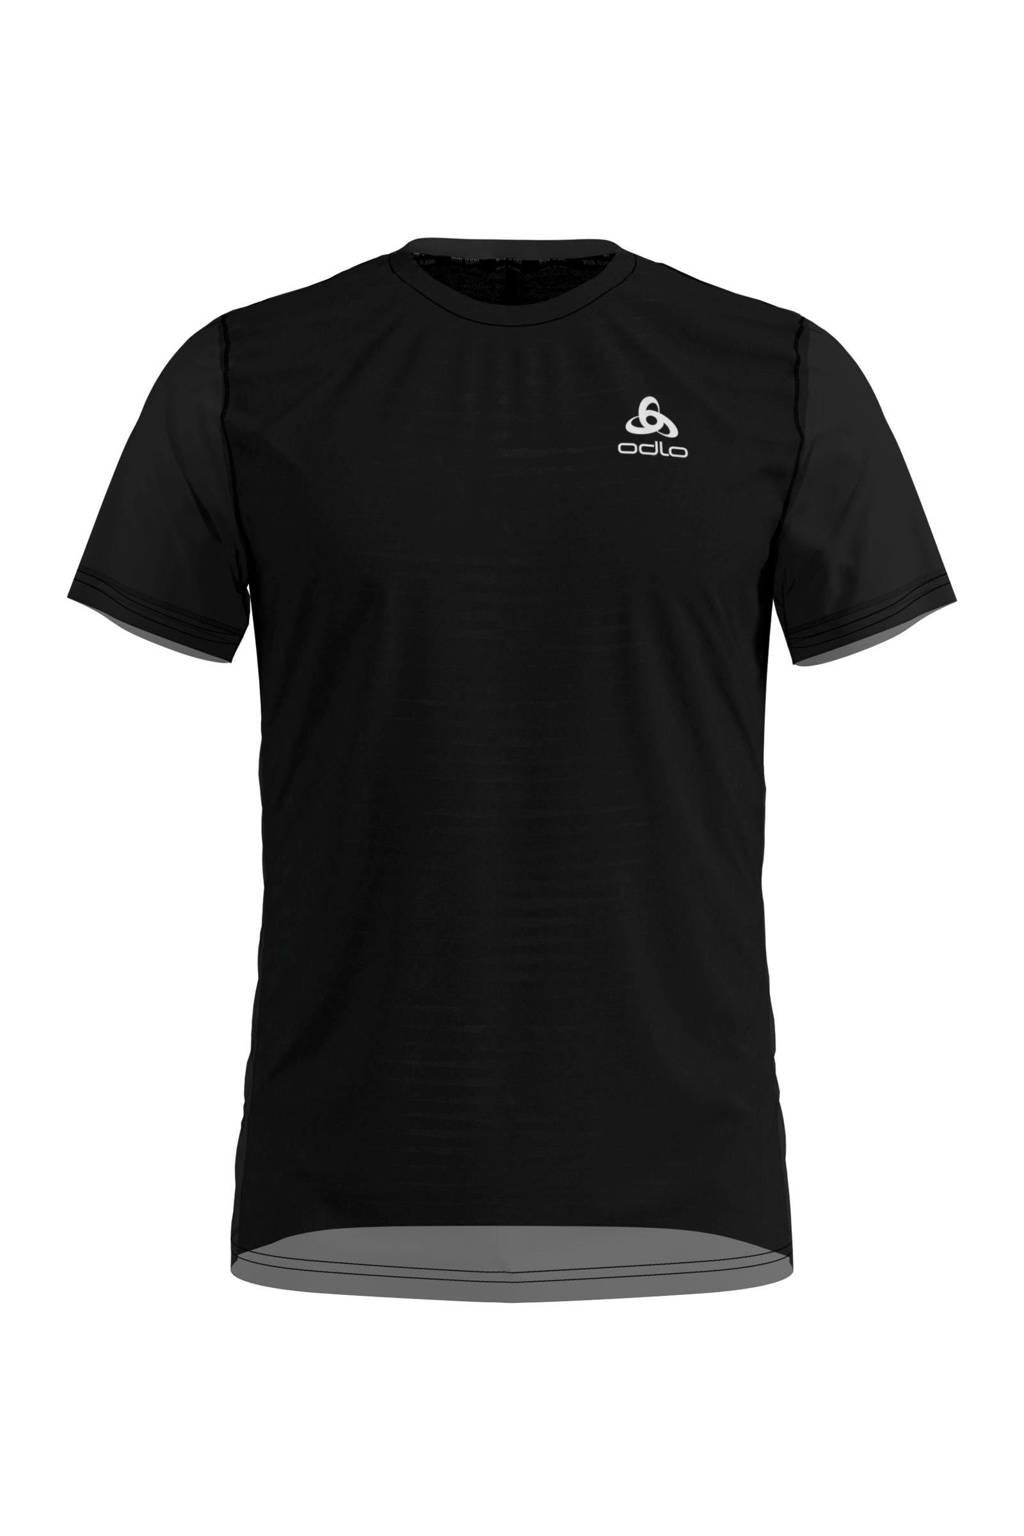 Odlo   hardloop T-shirt zwart, Zwart